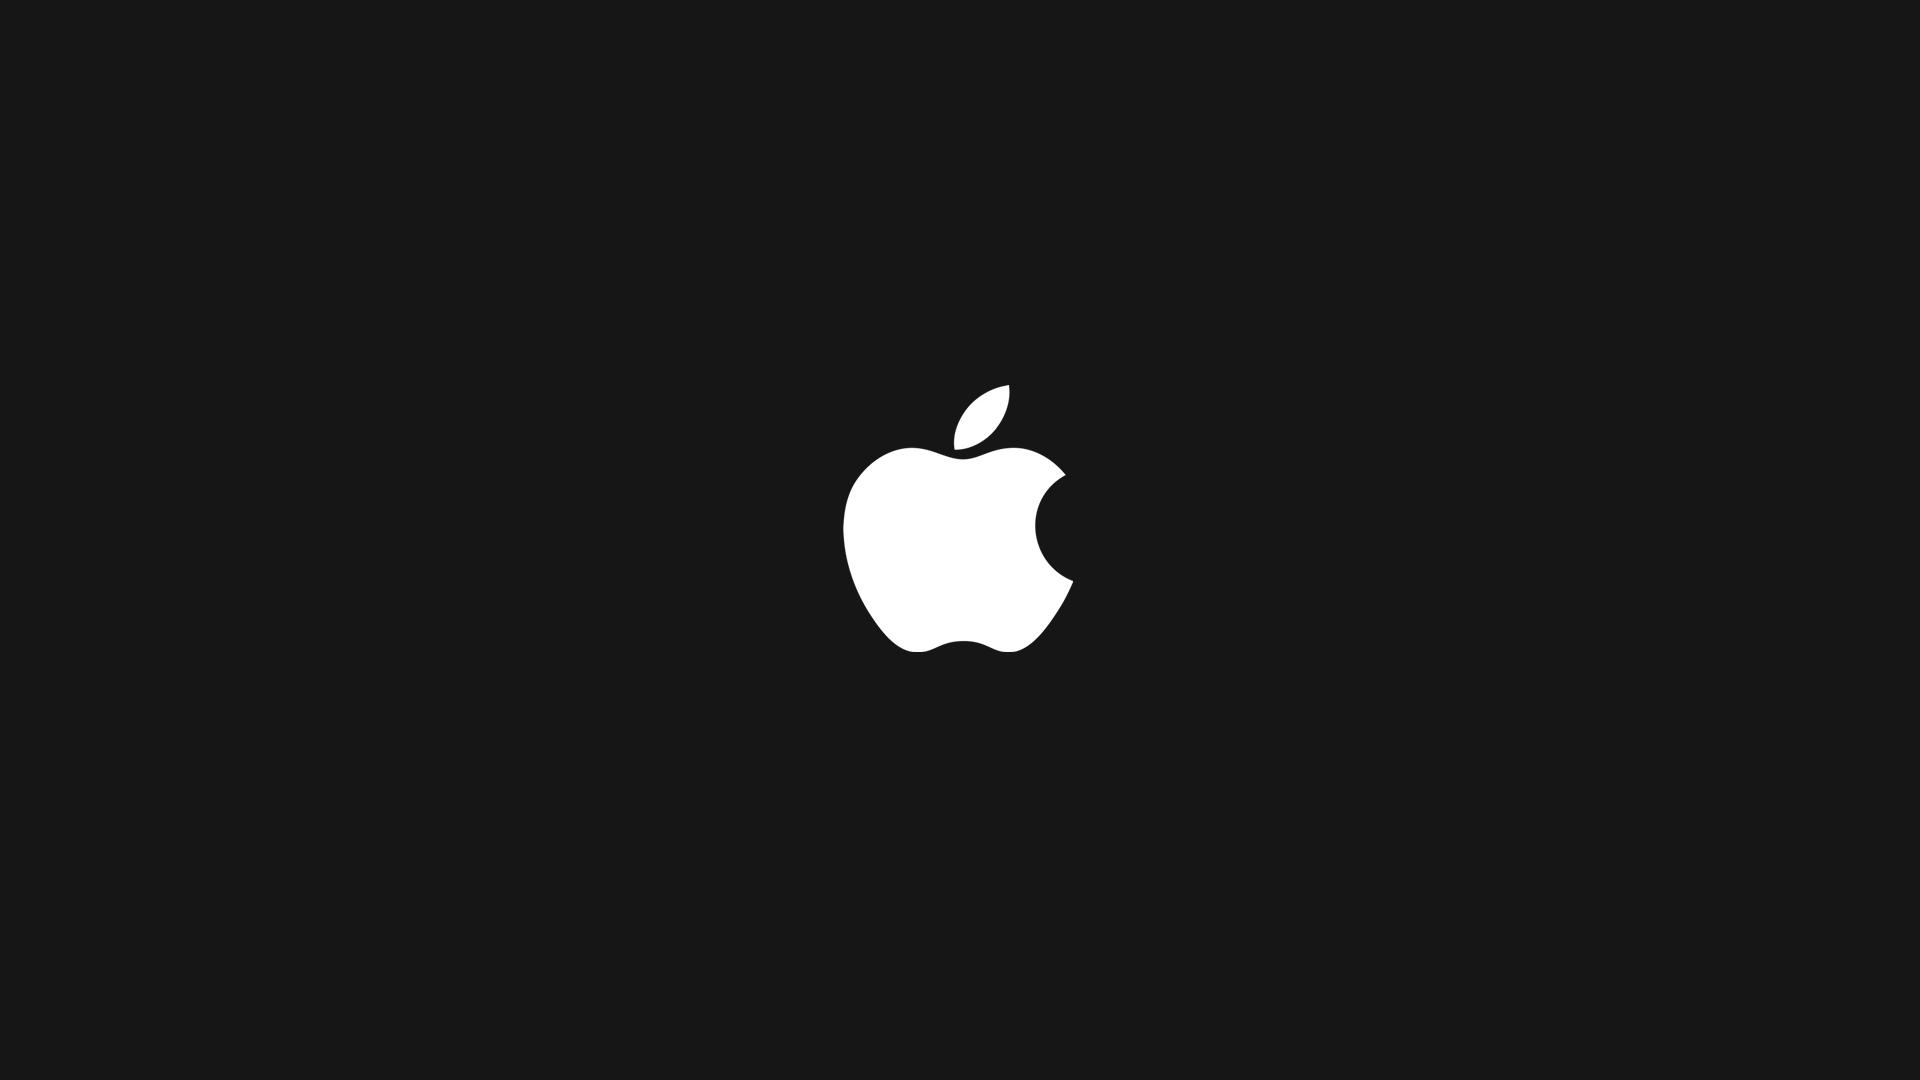 apple logo computers wallpapers computer 1920x1080 1920x1080